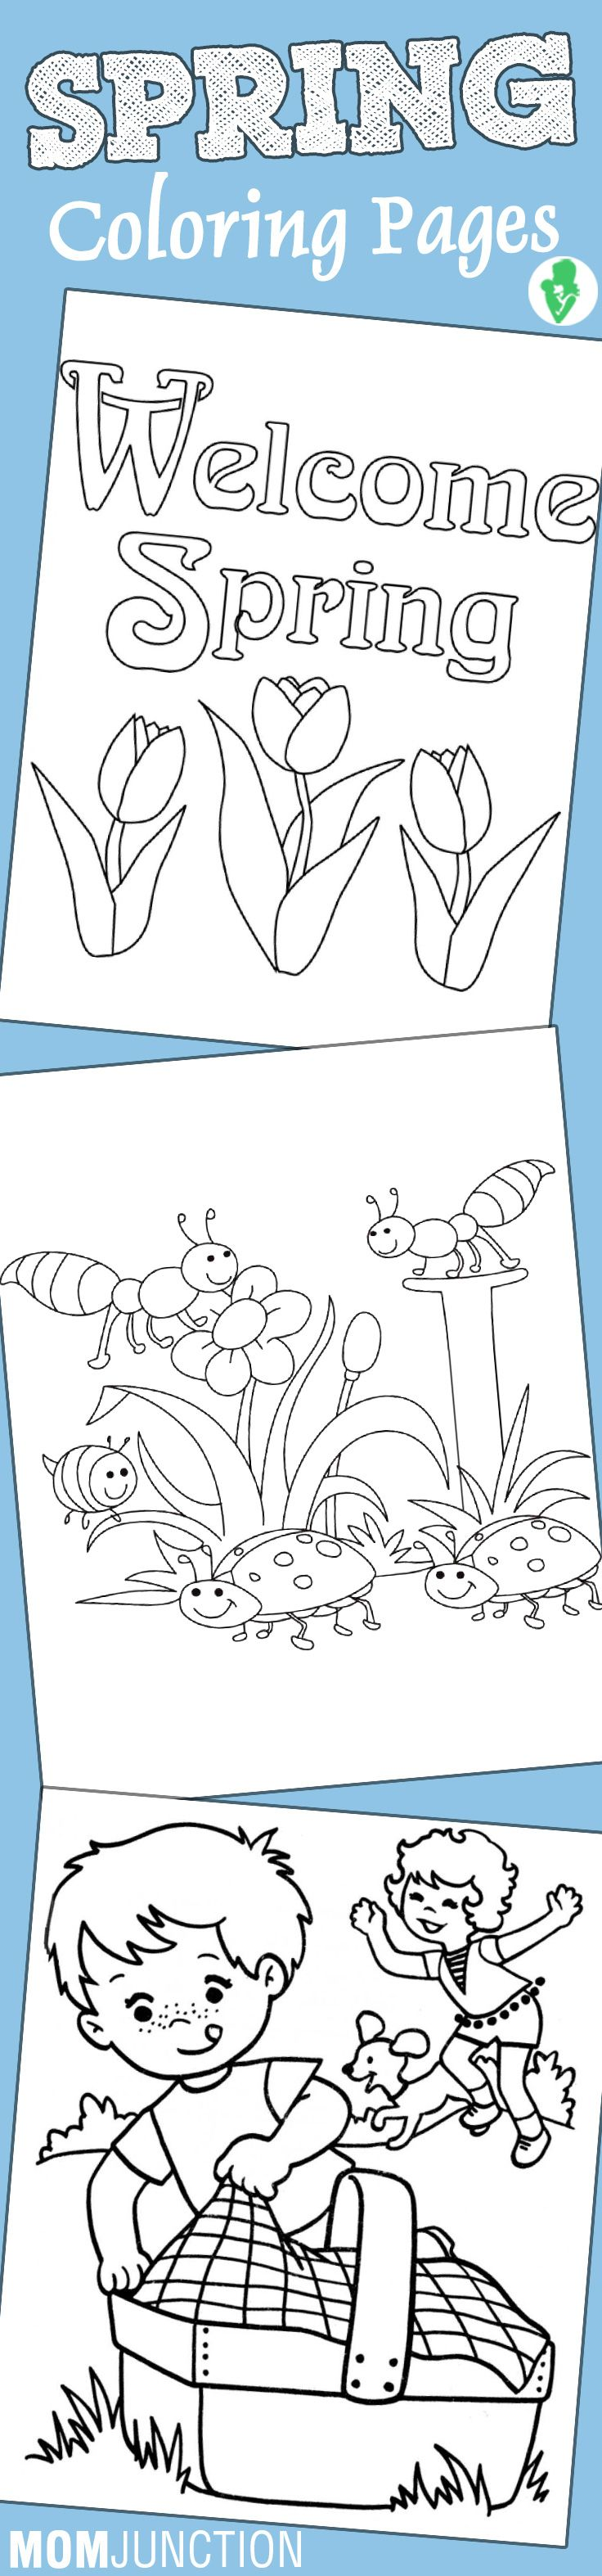 Online coloring kindergarten - Top 35 Free Printable Spring Coloring Pages Online